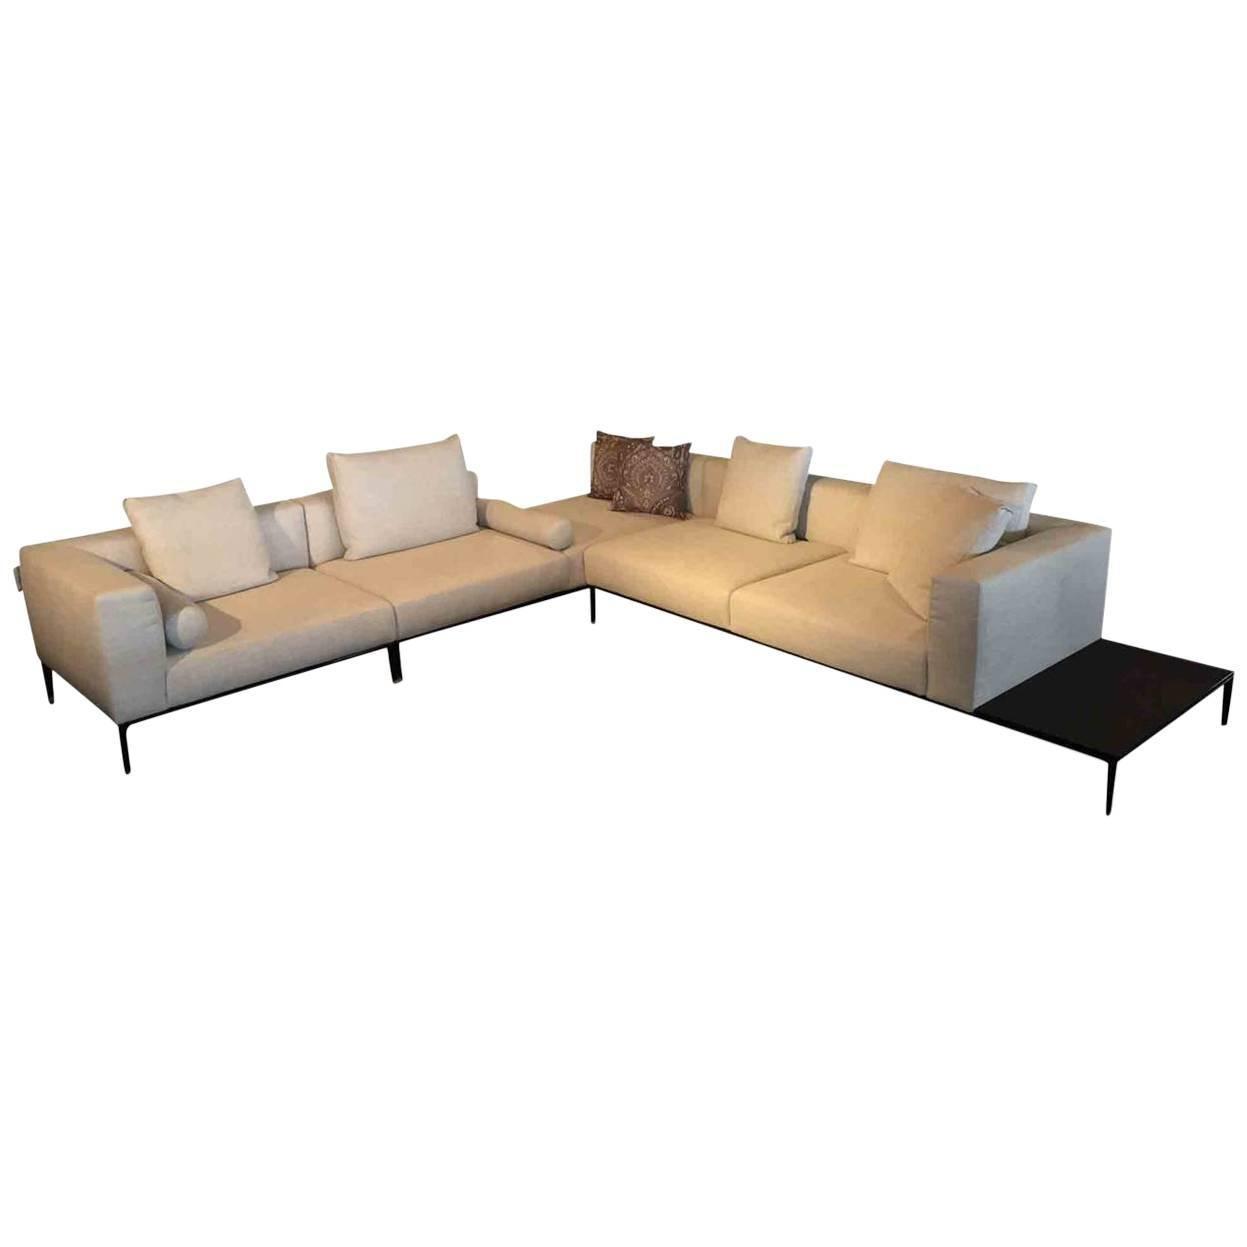 Sofa U0026quot;Jaan Livingu0026quot; By Manufacturer Walter Knoll In Wood,  Aluminium And Fabric